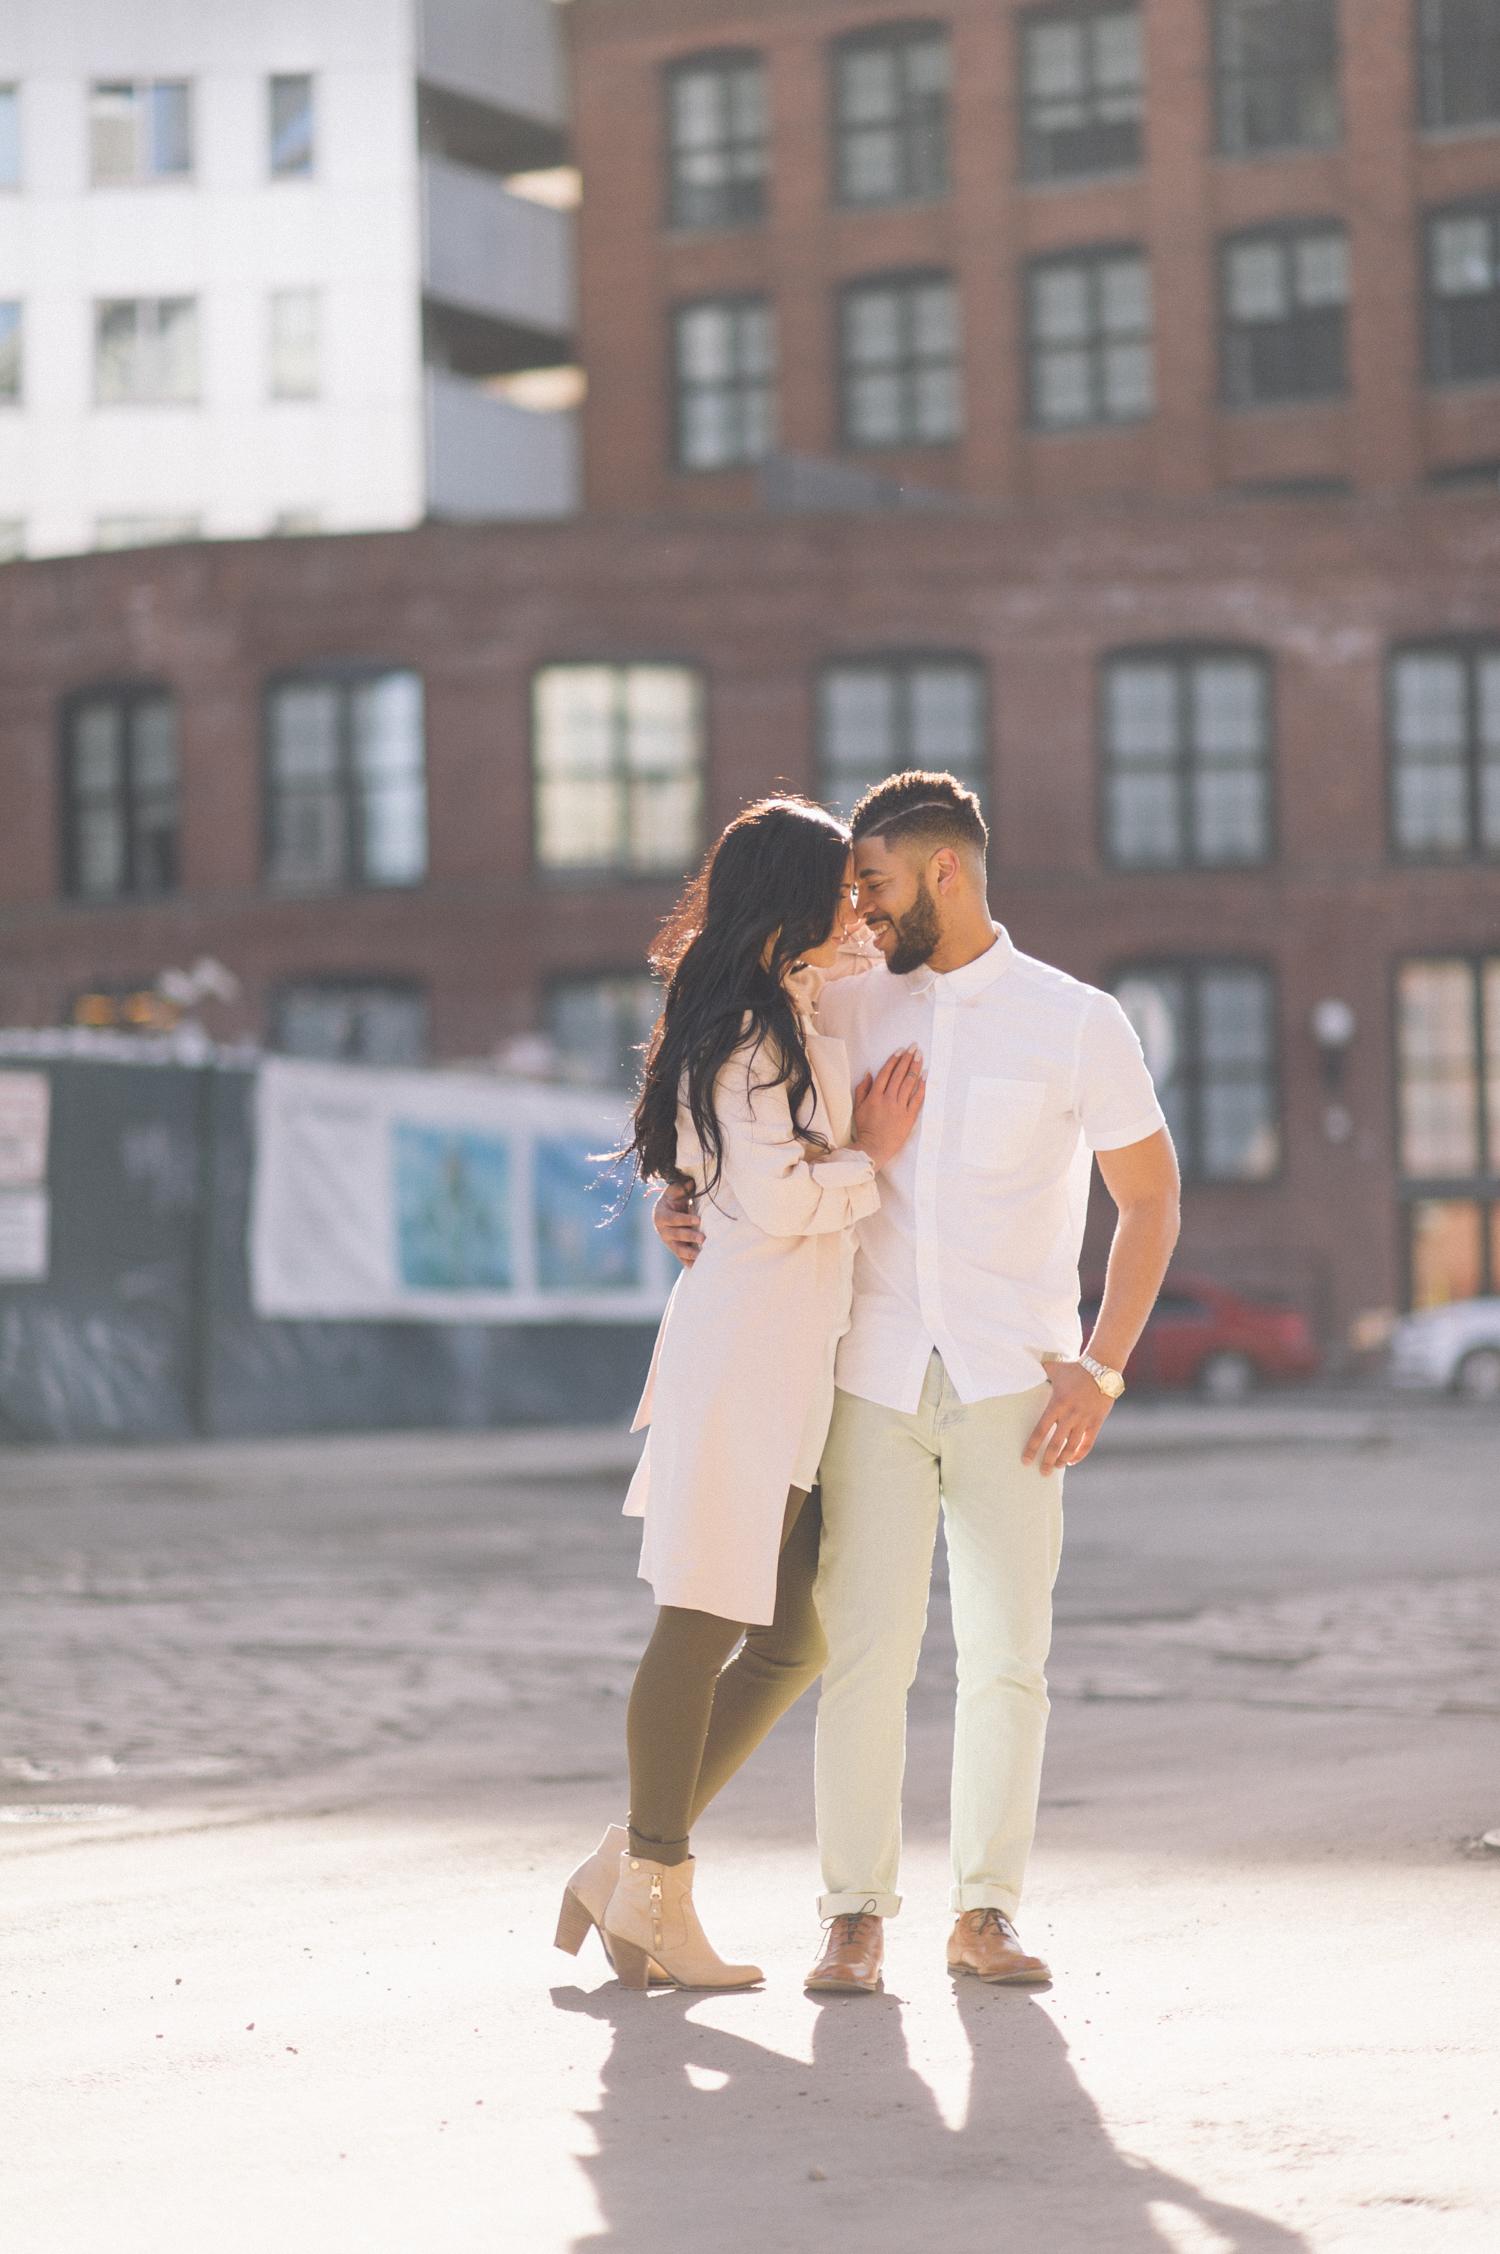 DUMBO.Brooklyn.Engagements14.jpg